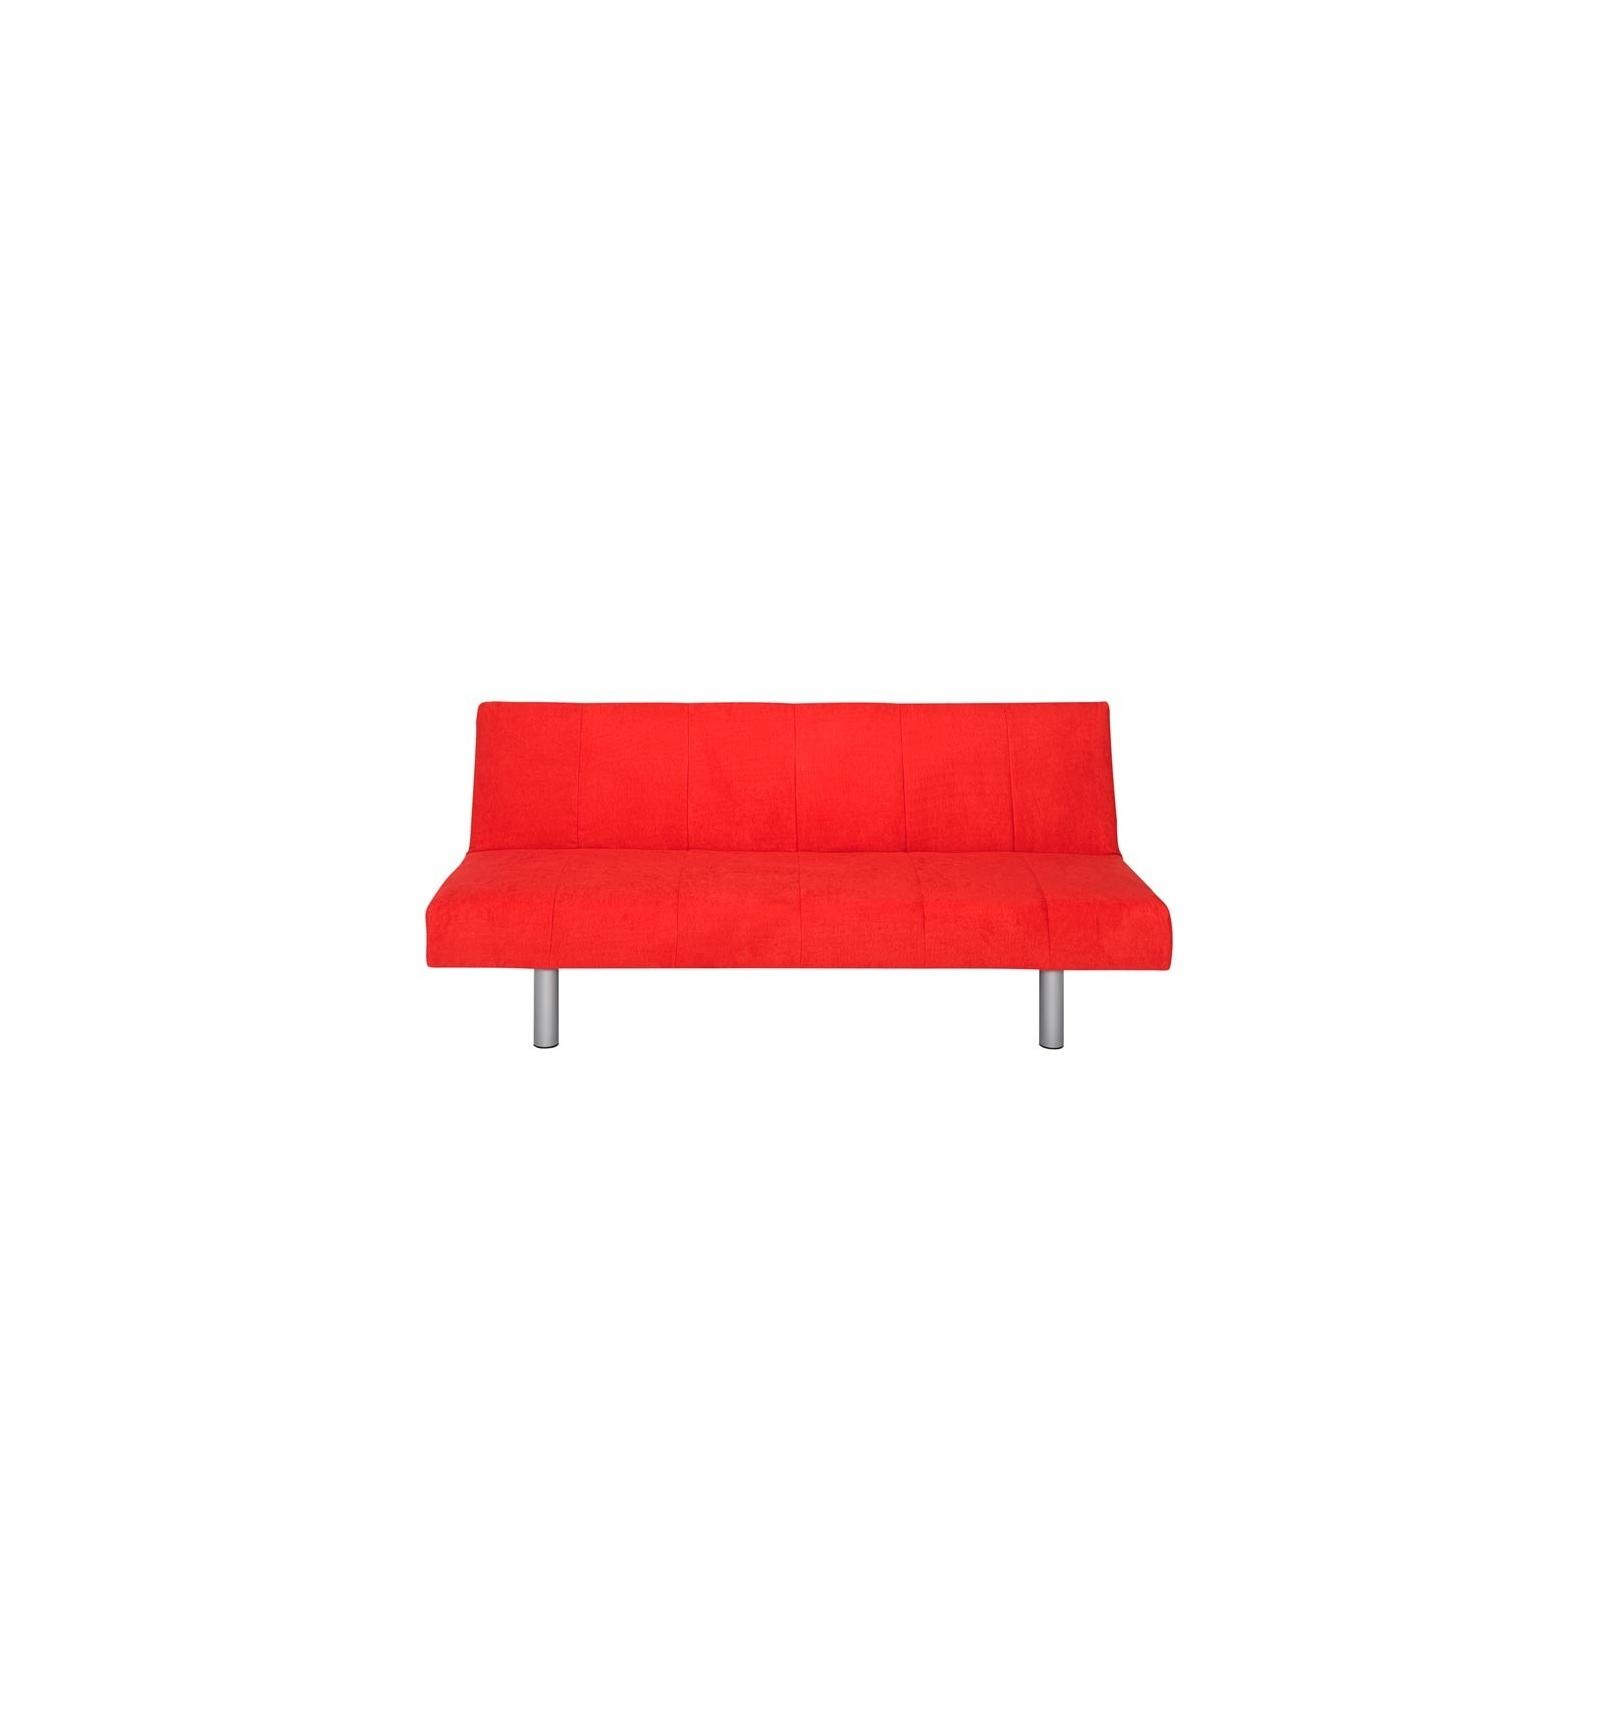 Awesome divano letto rosso photos amazing house design - Divano letto usato bologna ...